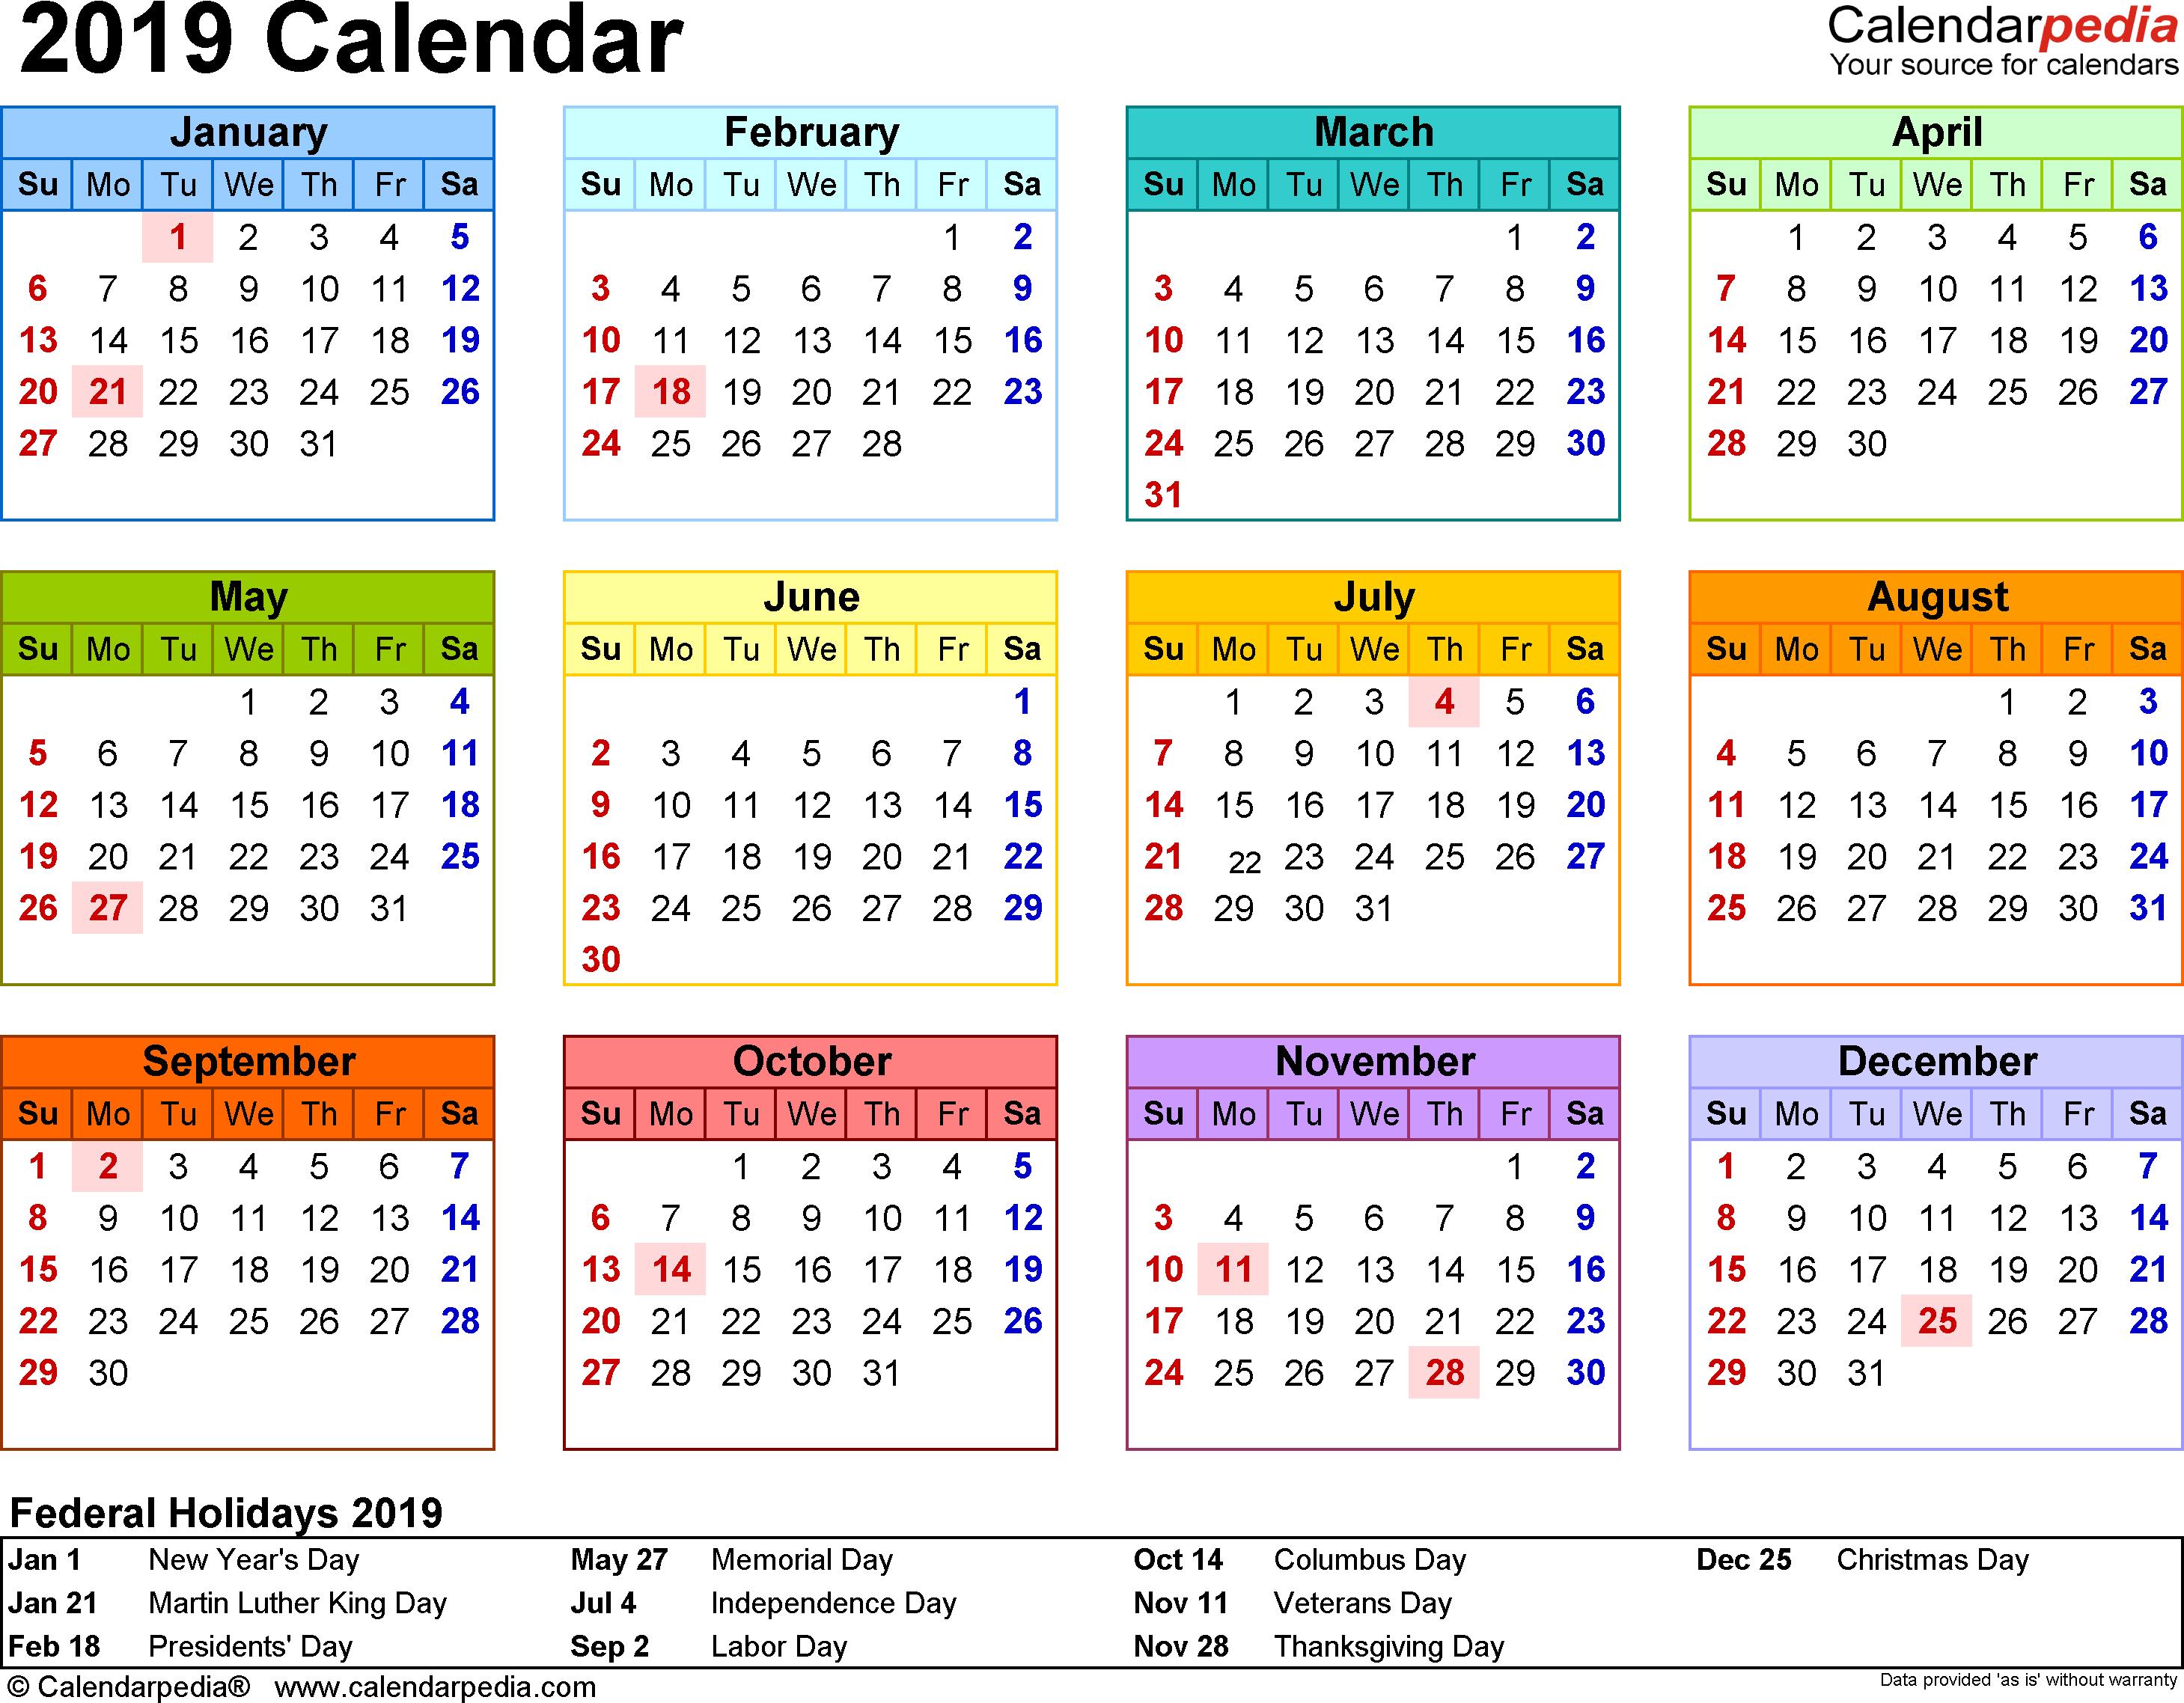 2019 Calendar - Download 18 Free Printable Excel Templates